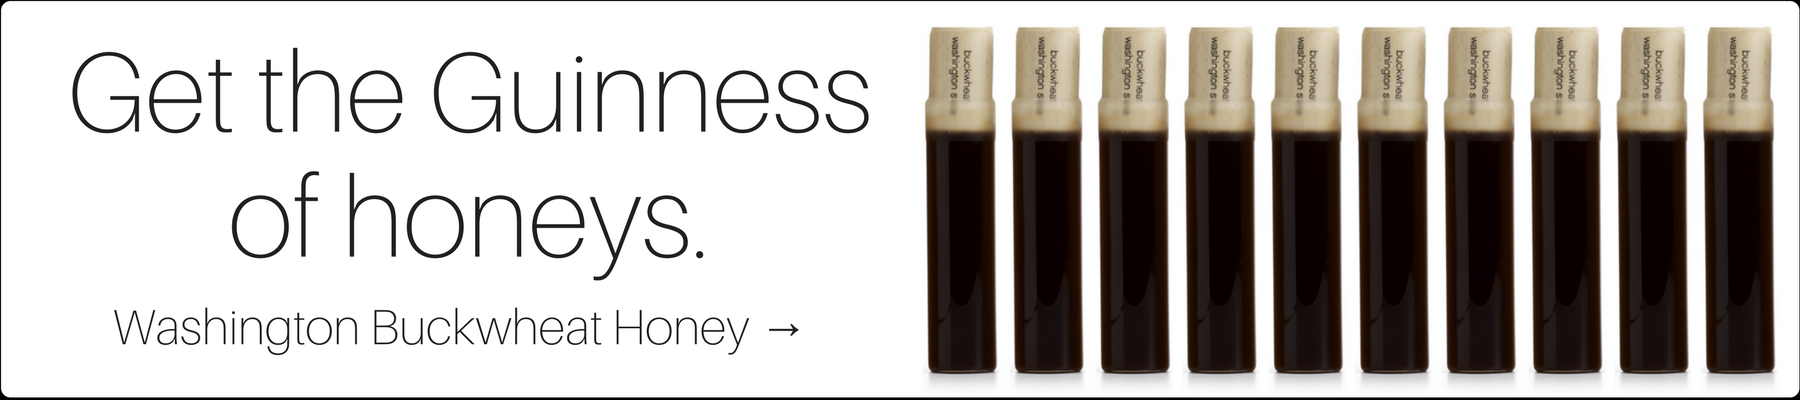 Get the Guinness of honeys: Washington Buckwheat